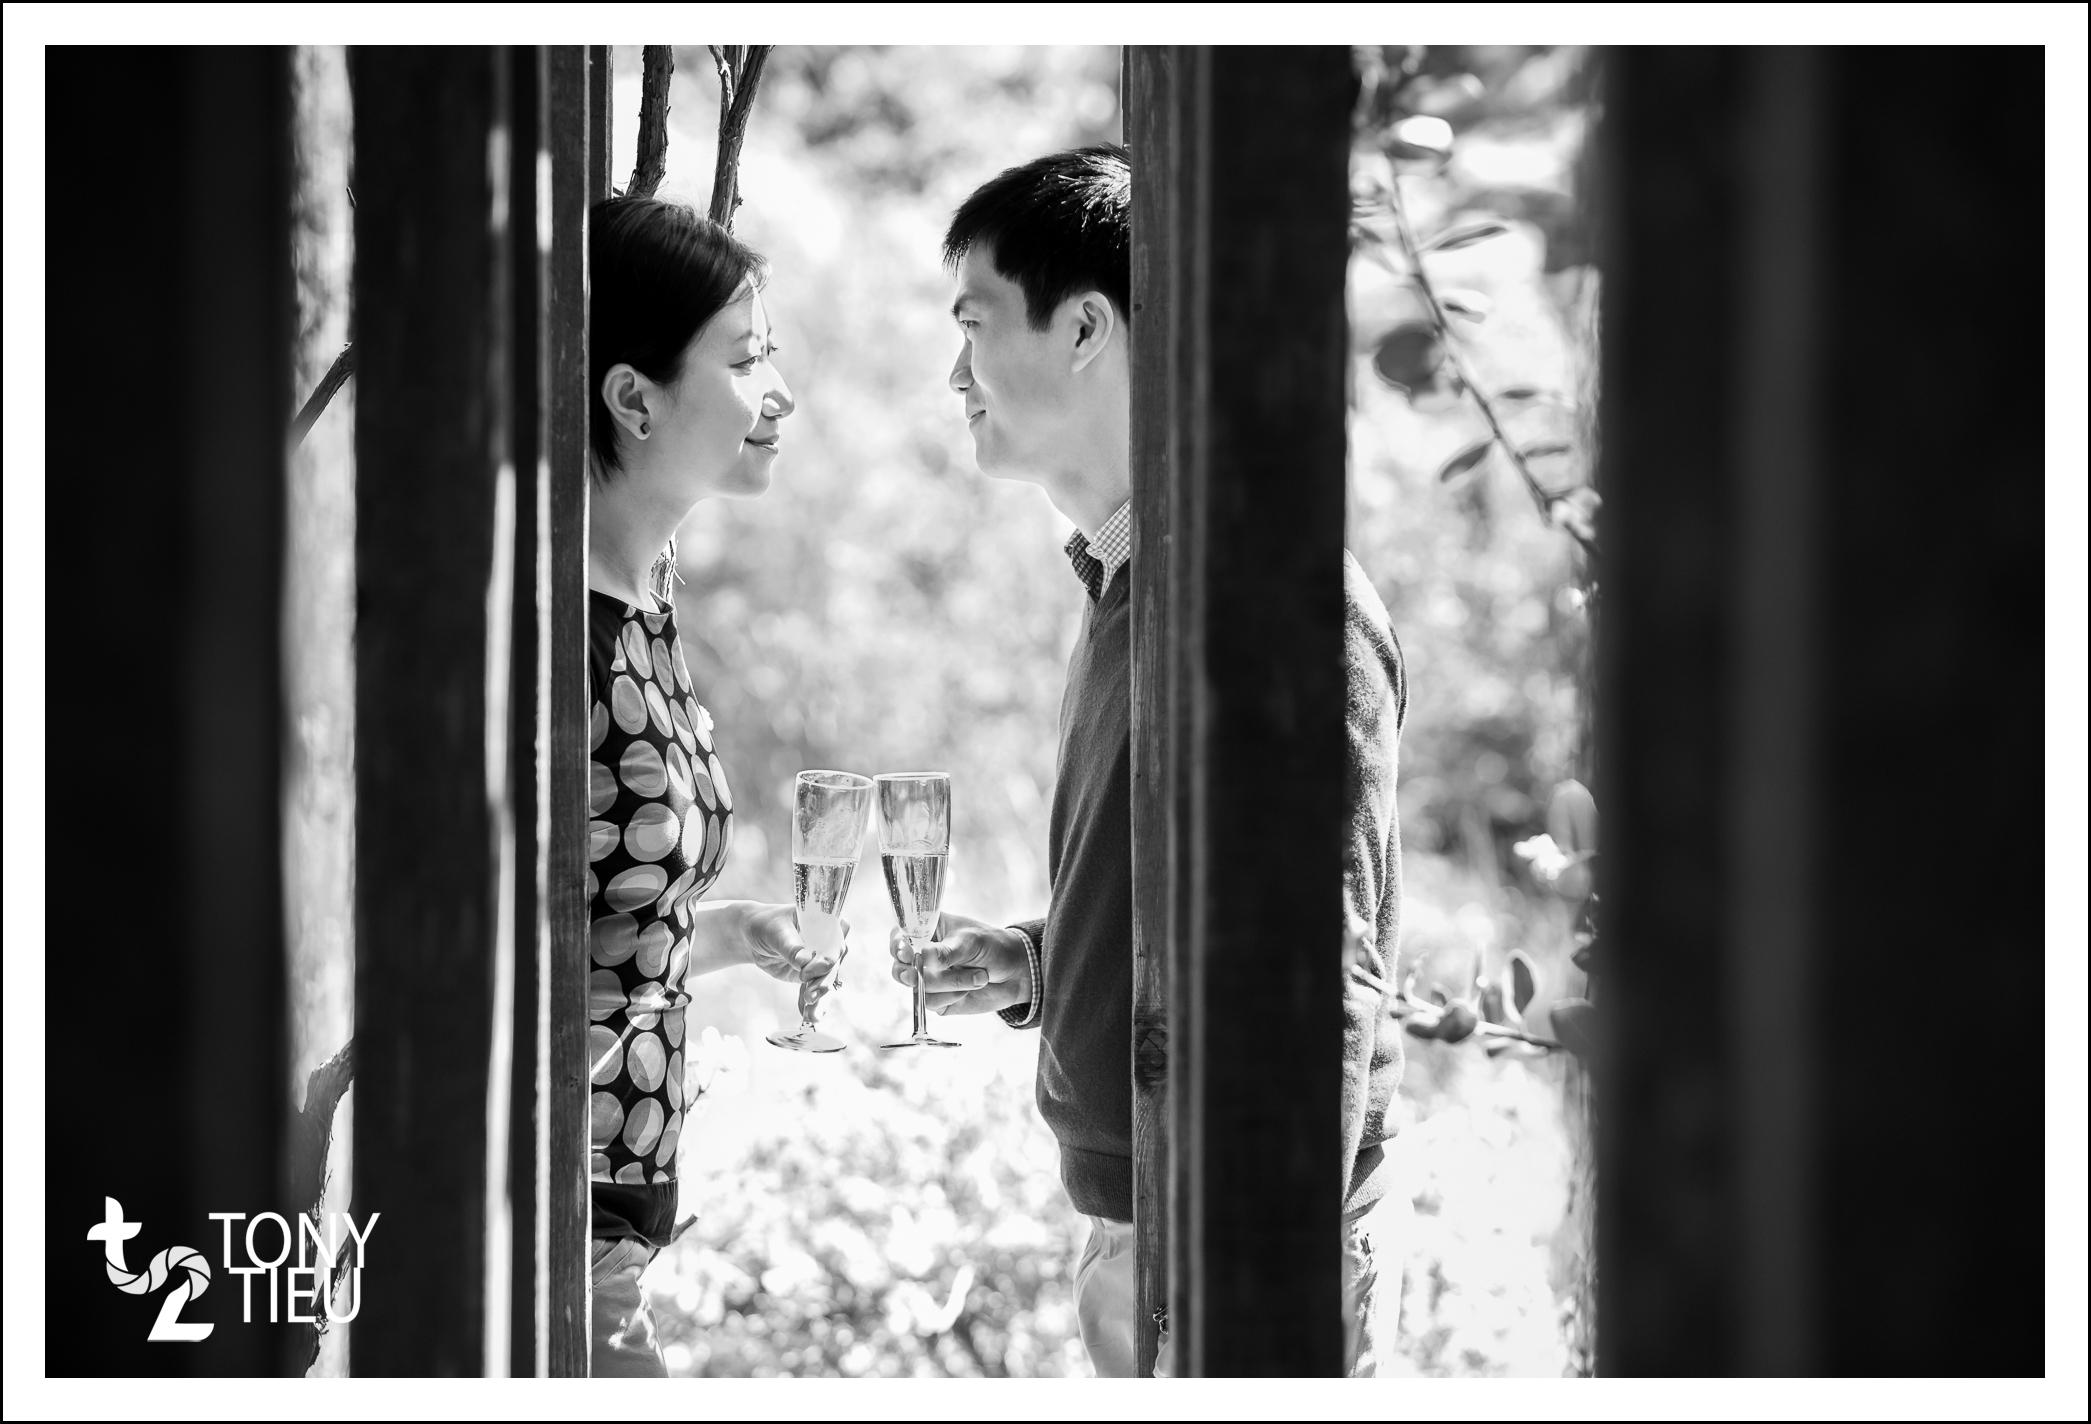 Tony_Tieu_Yang Jimmy_Engagement_16